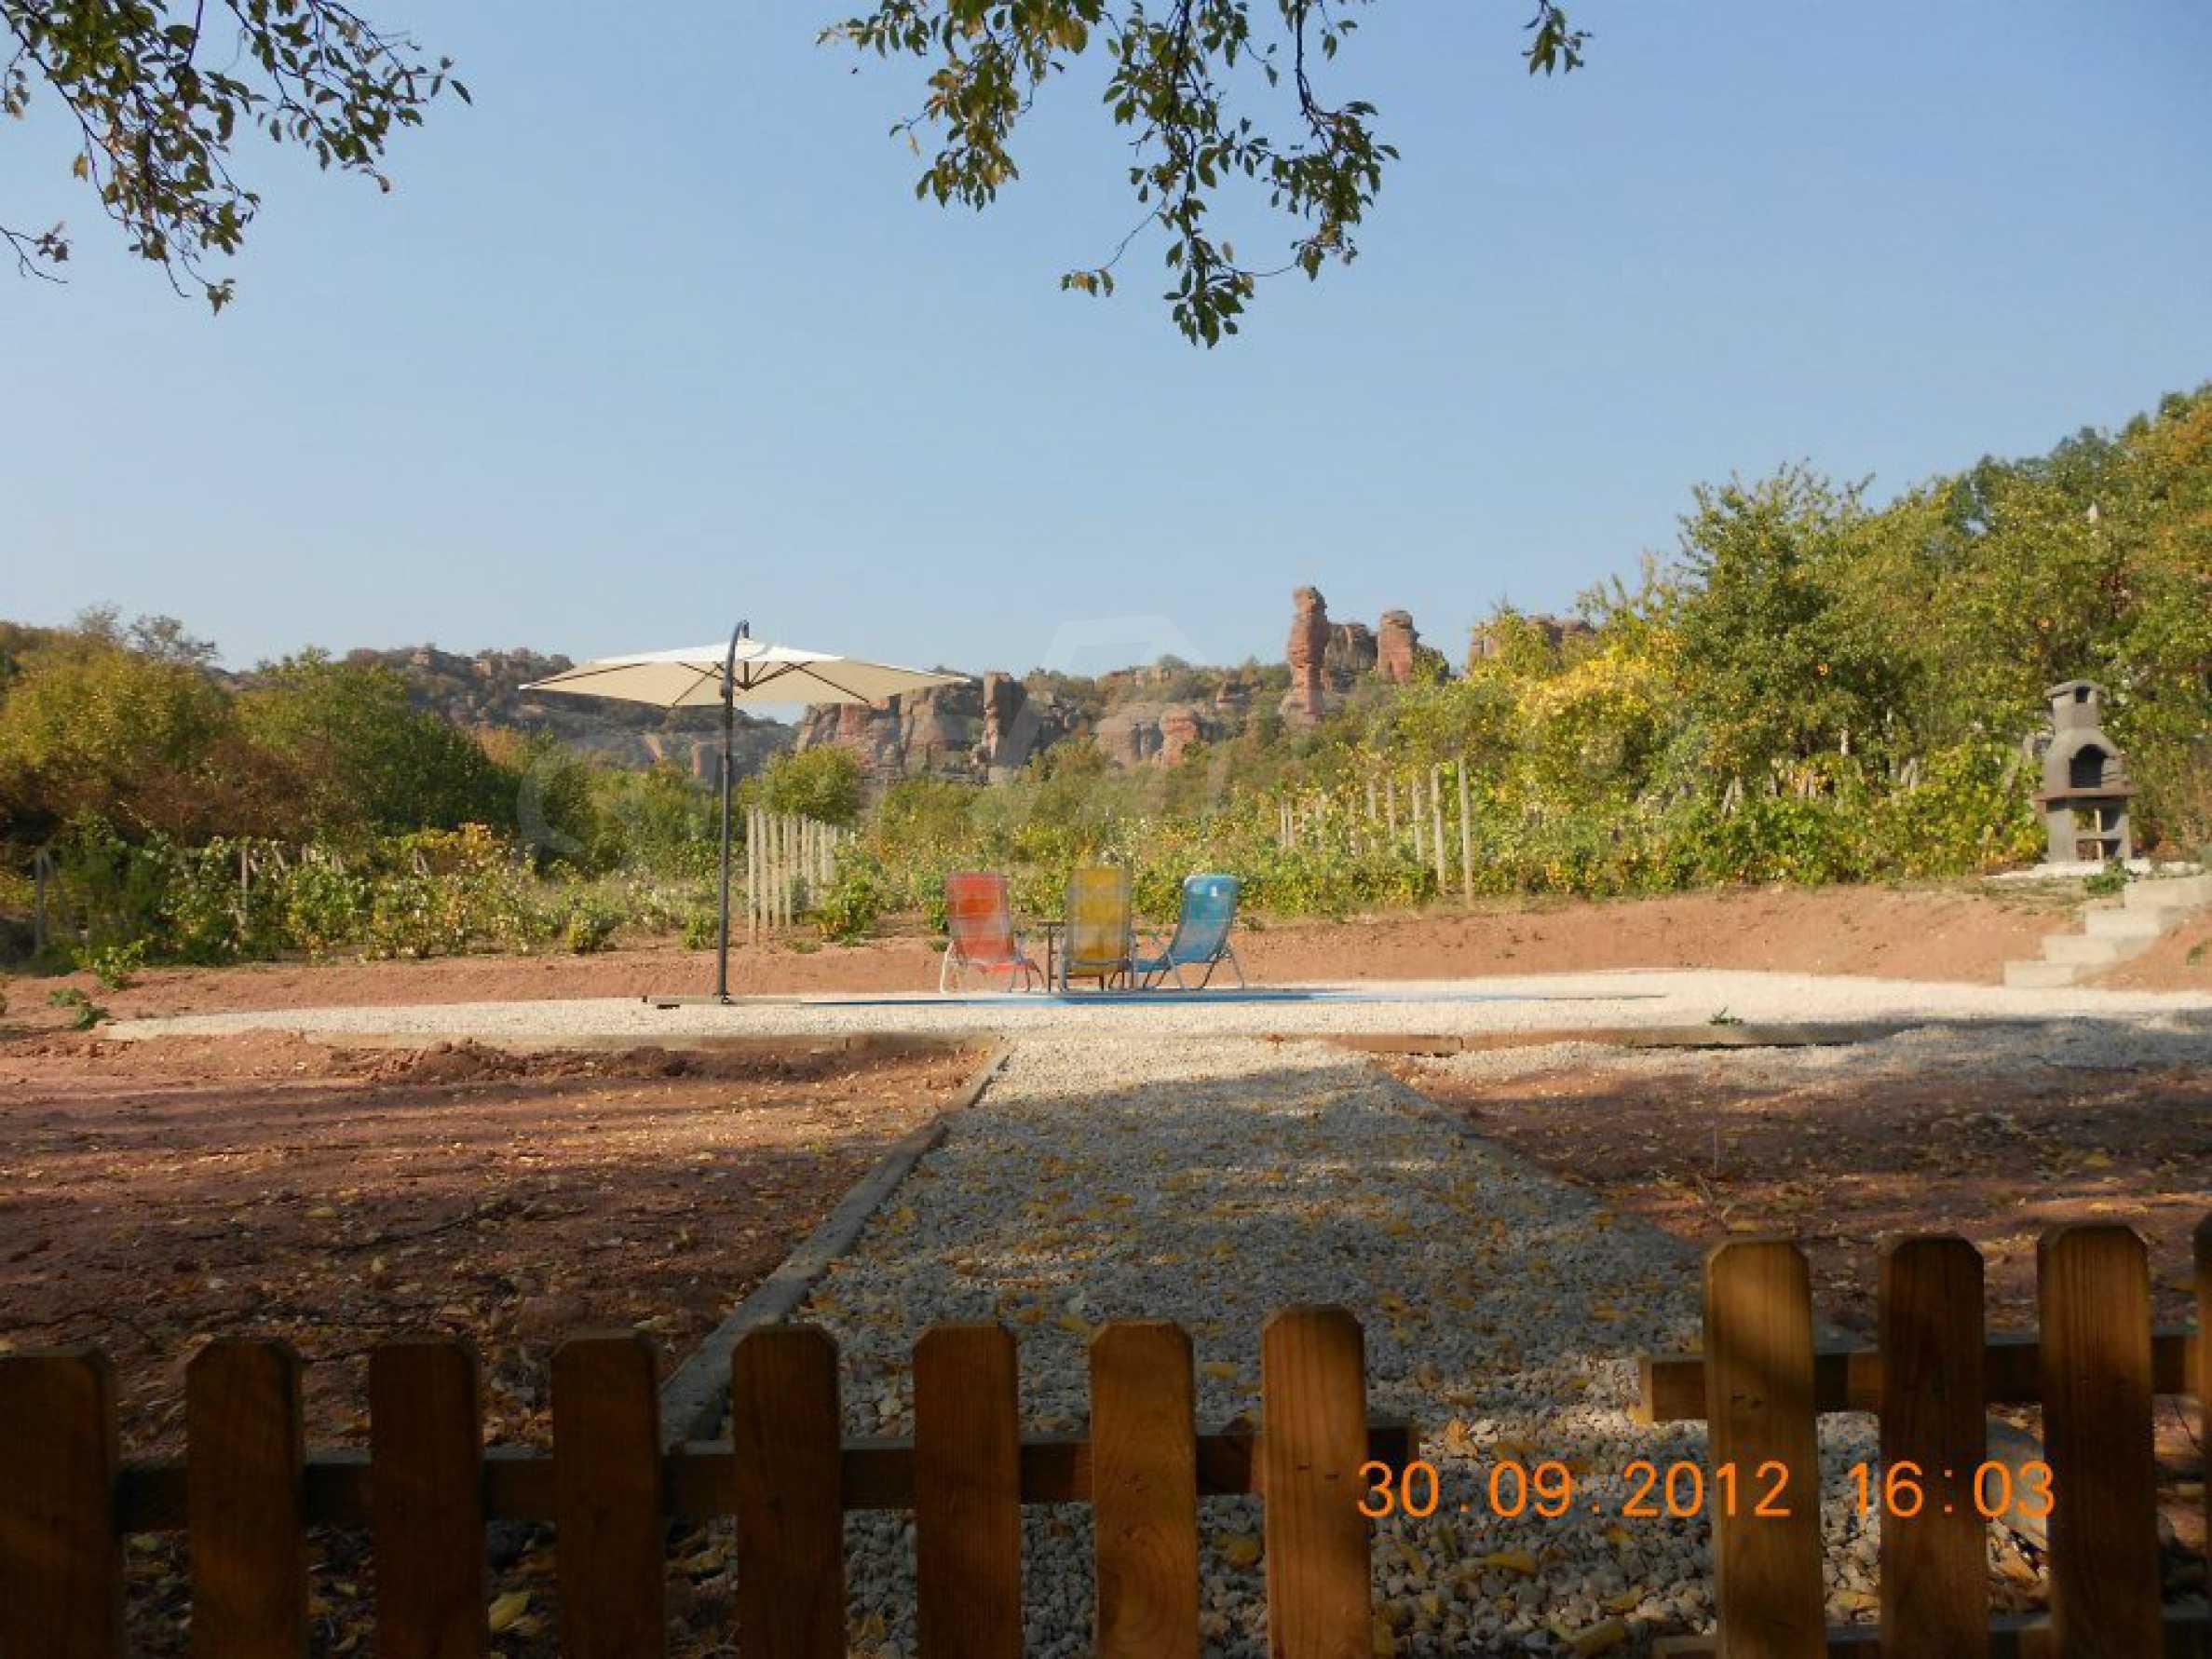 3-storey villa with garden and small plunge pool near Belogradchik 31